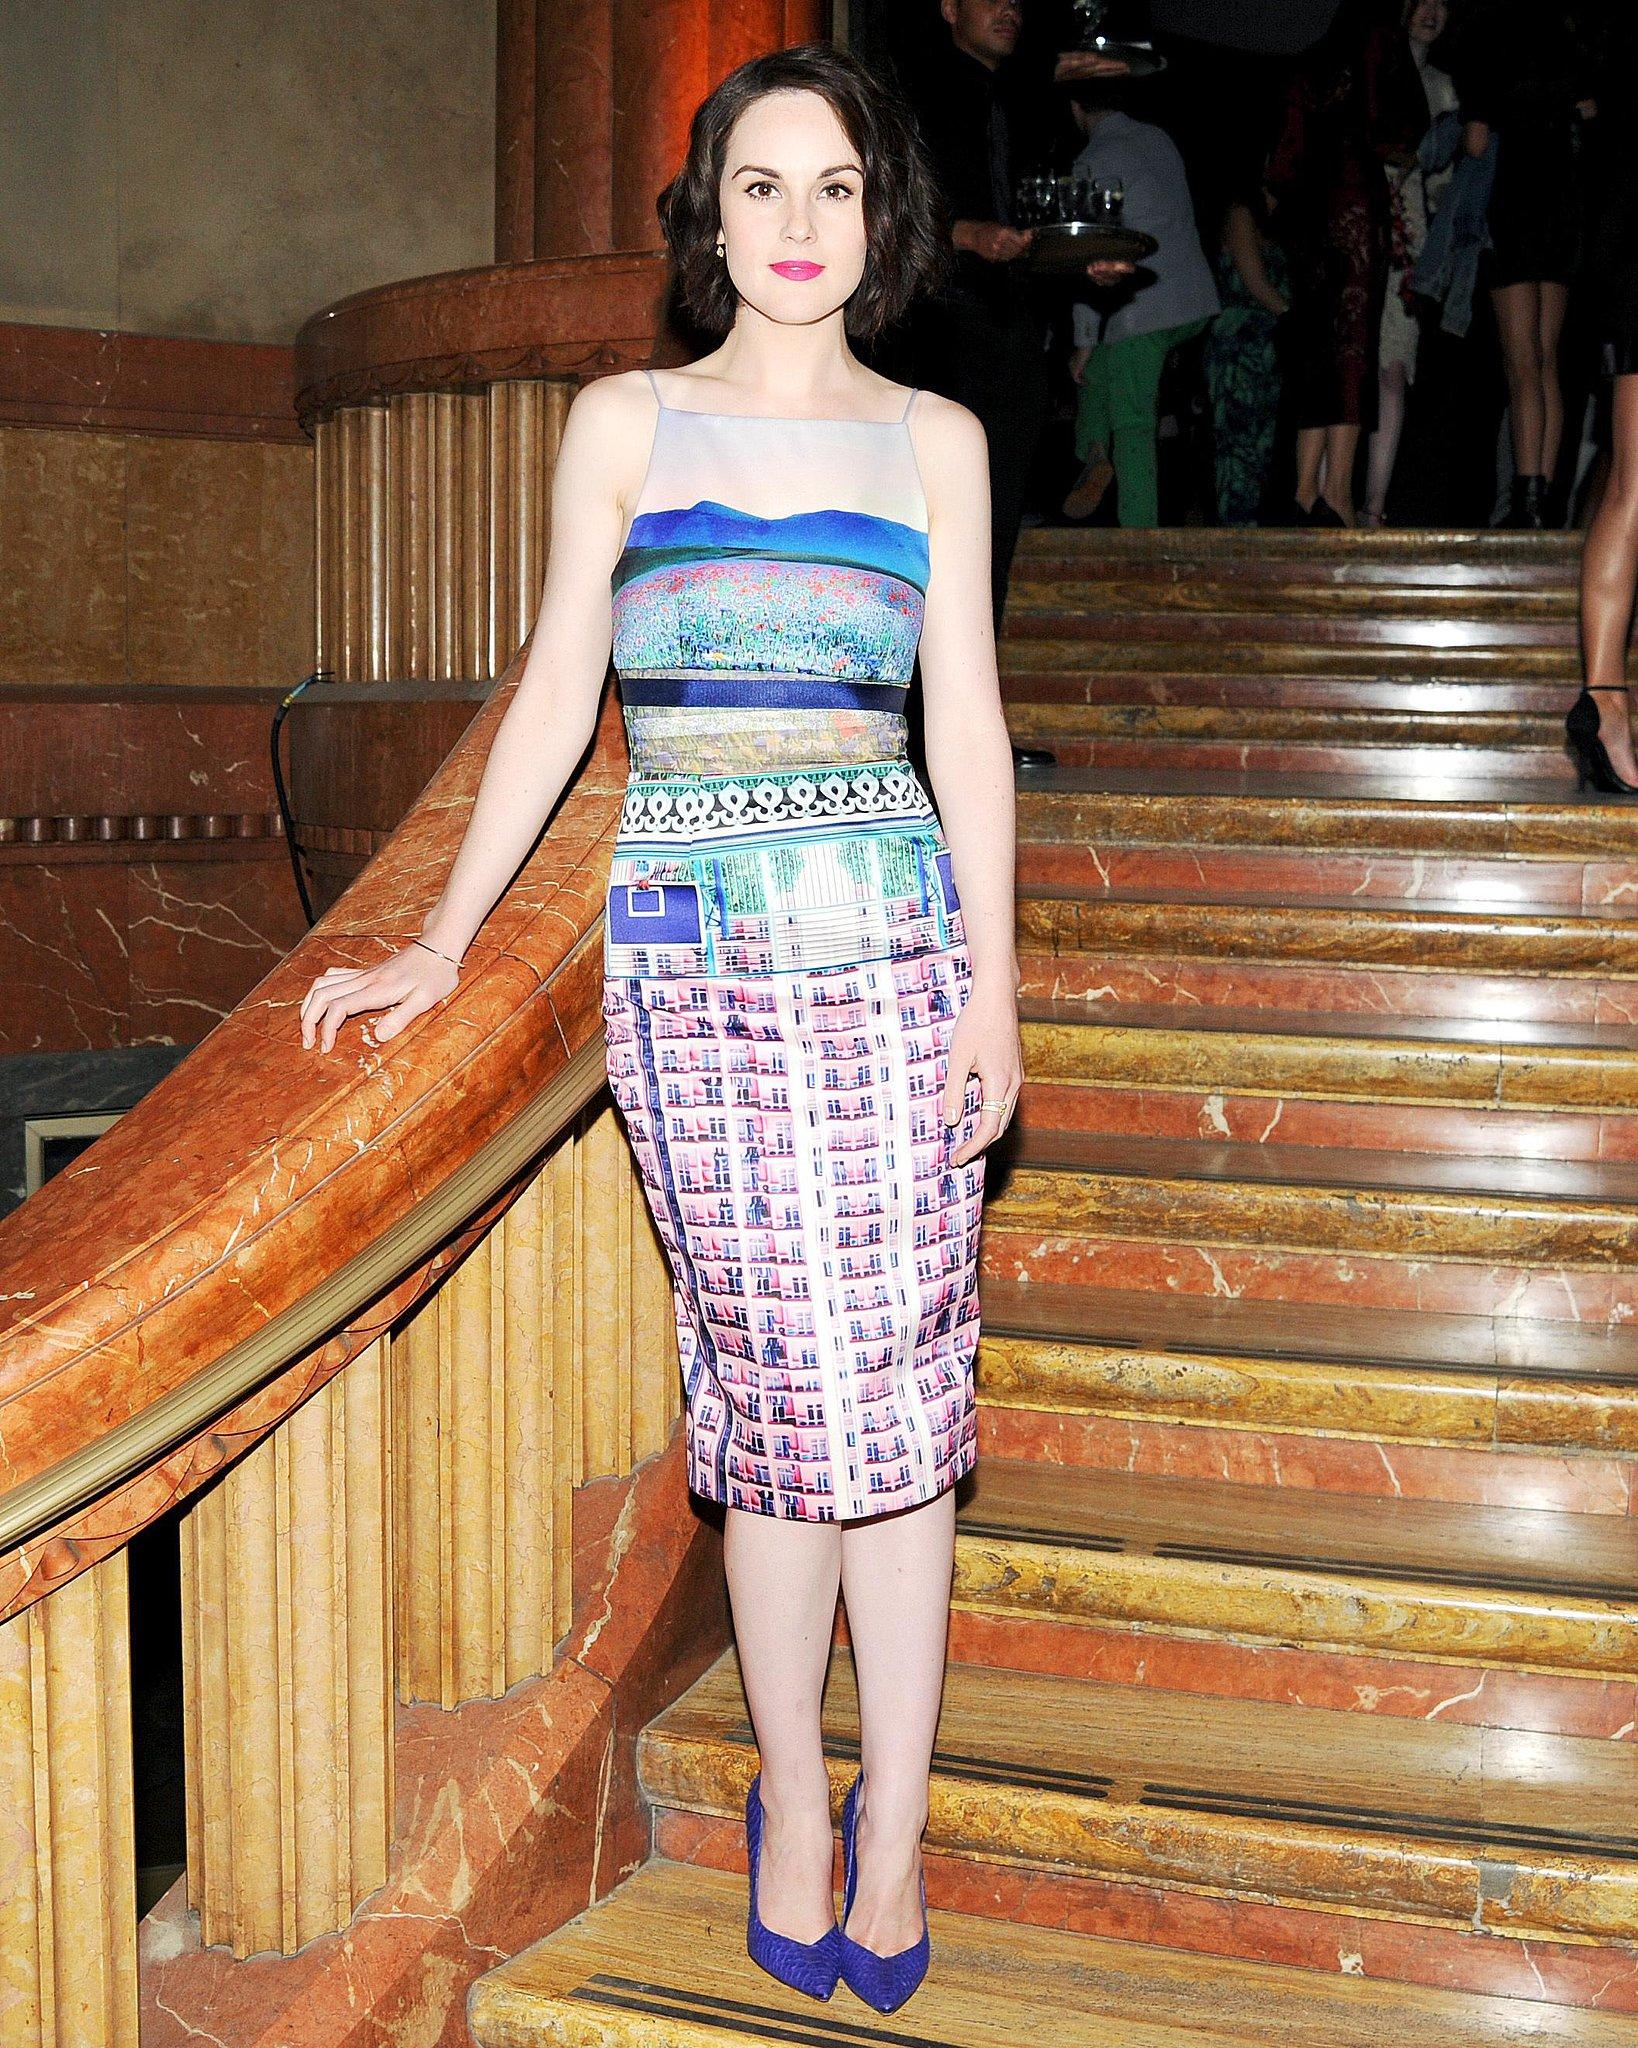 Michelle Dockery posed on a staircase. Source: Jason Merritt/BFAnyc.com